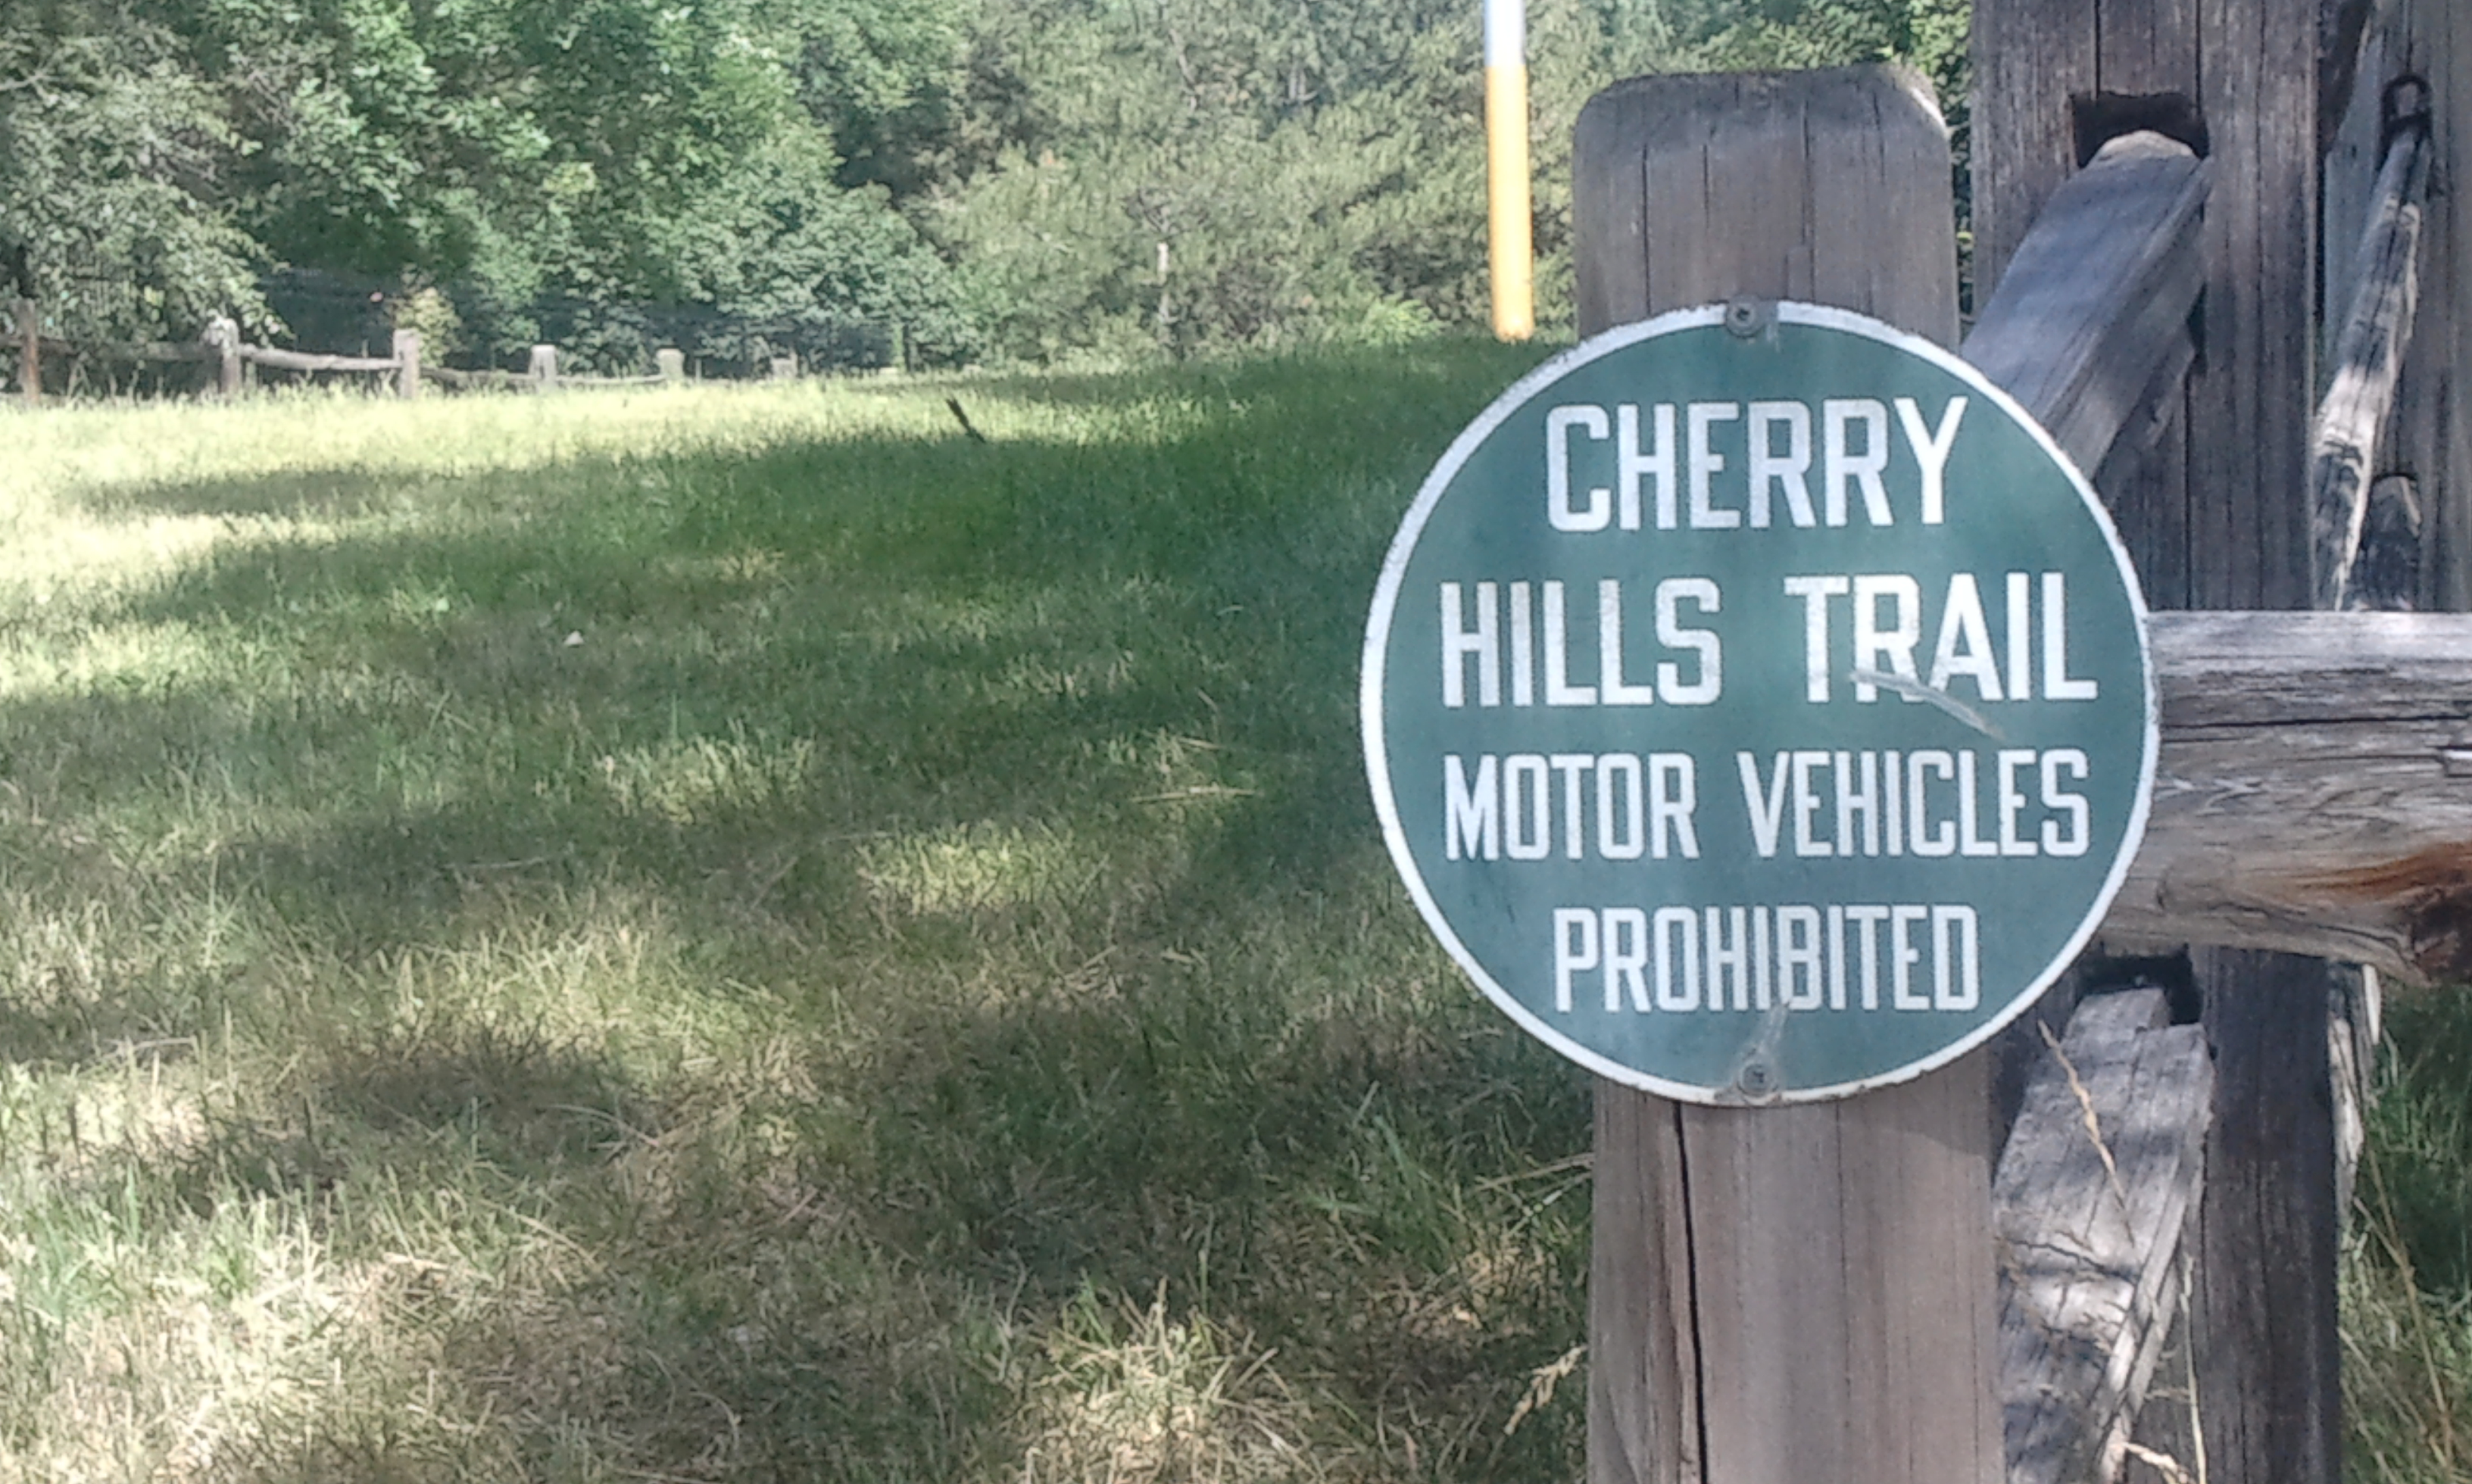 Cherry Hills Trail sign